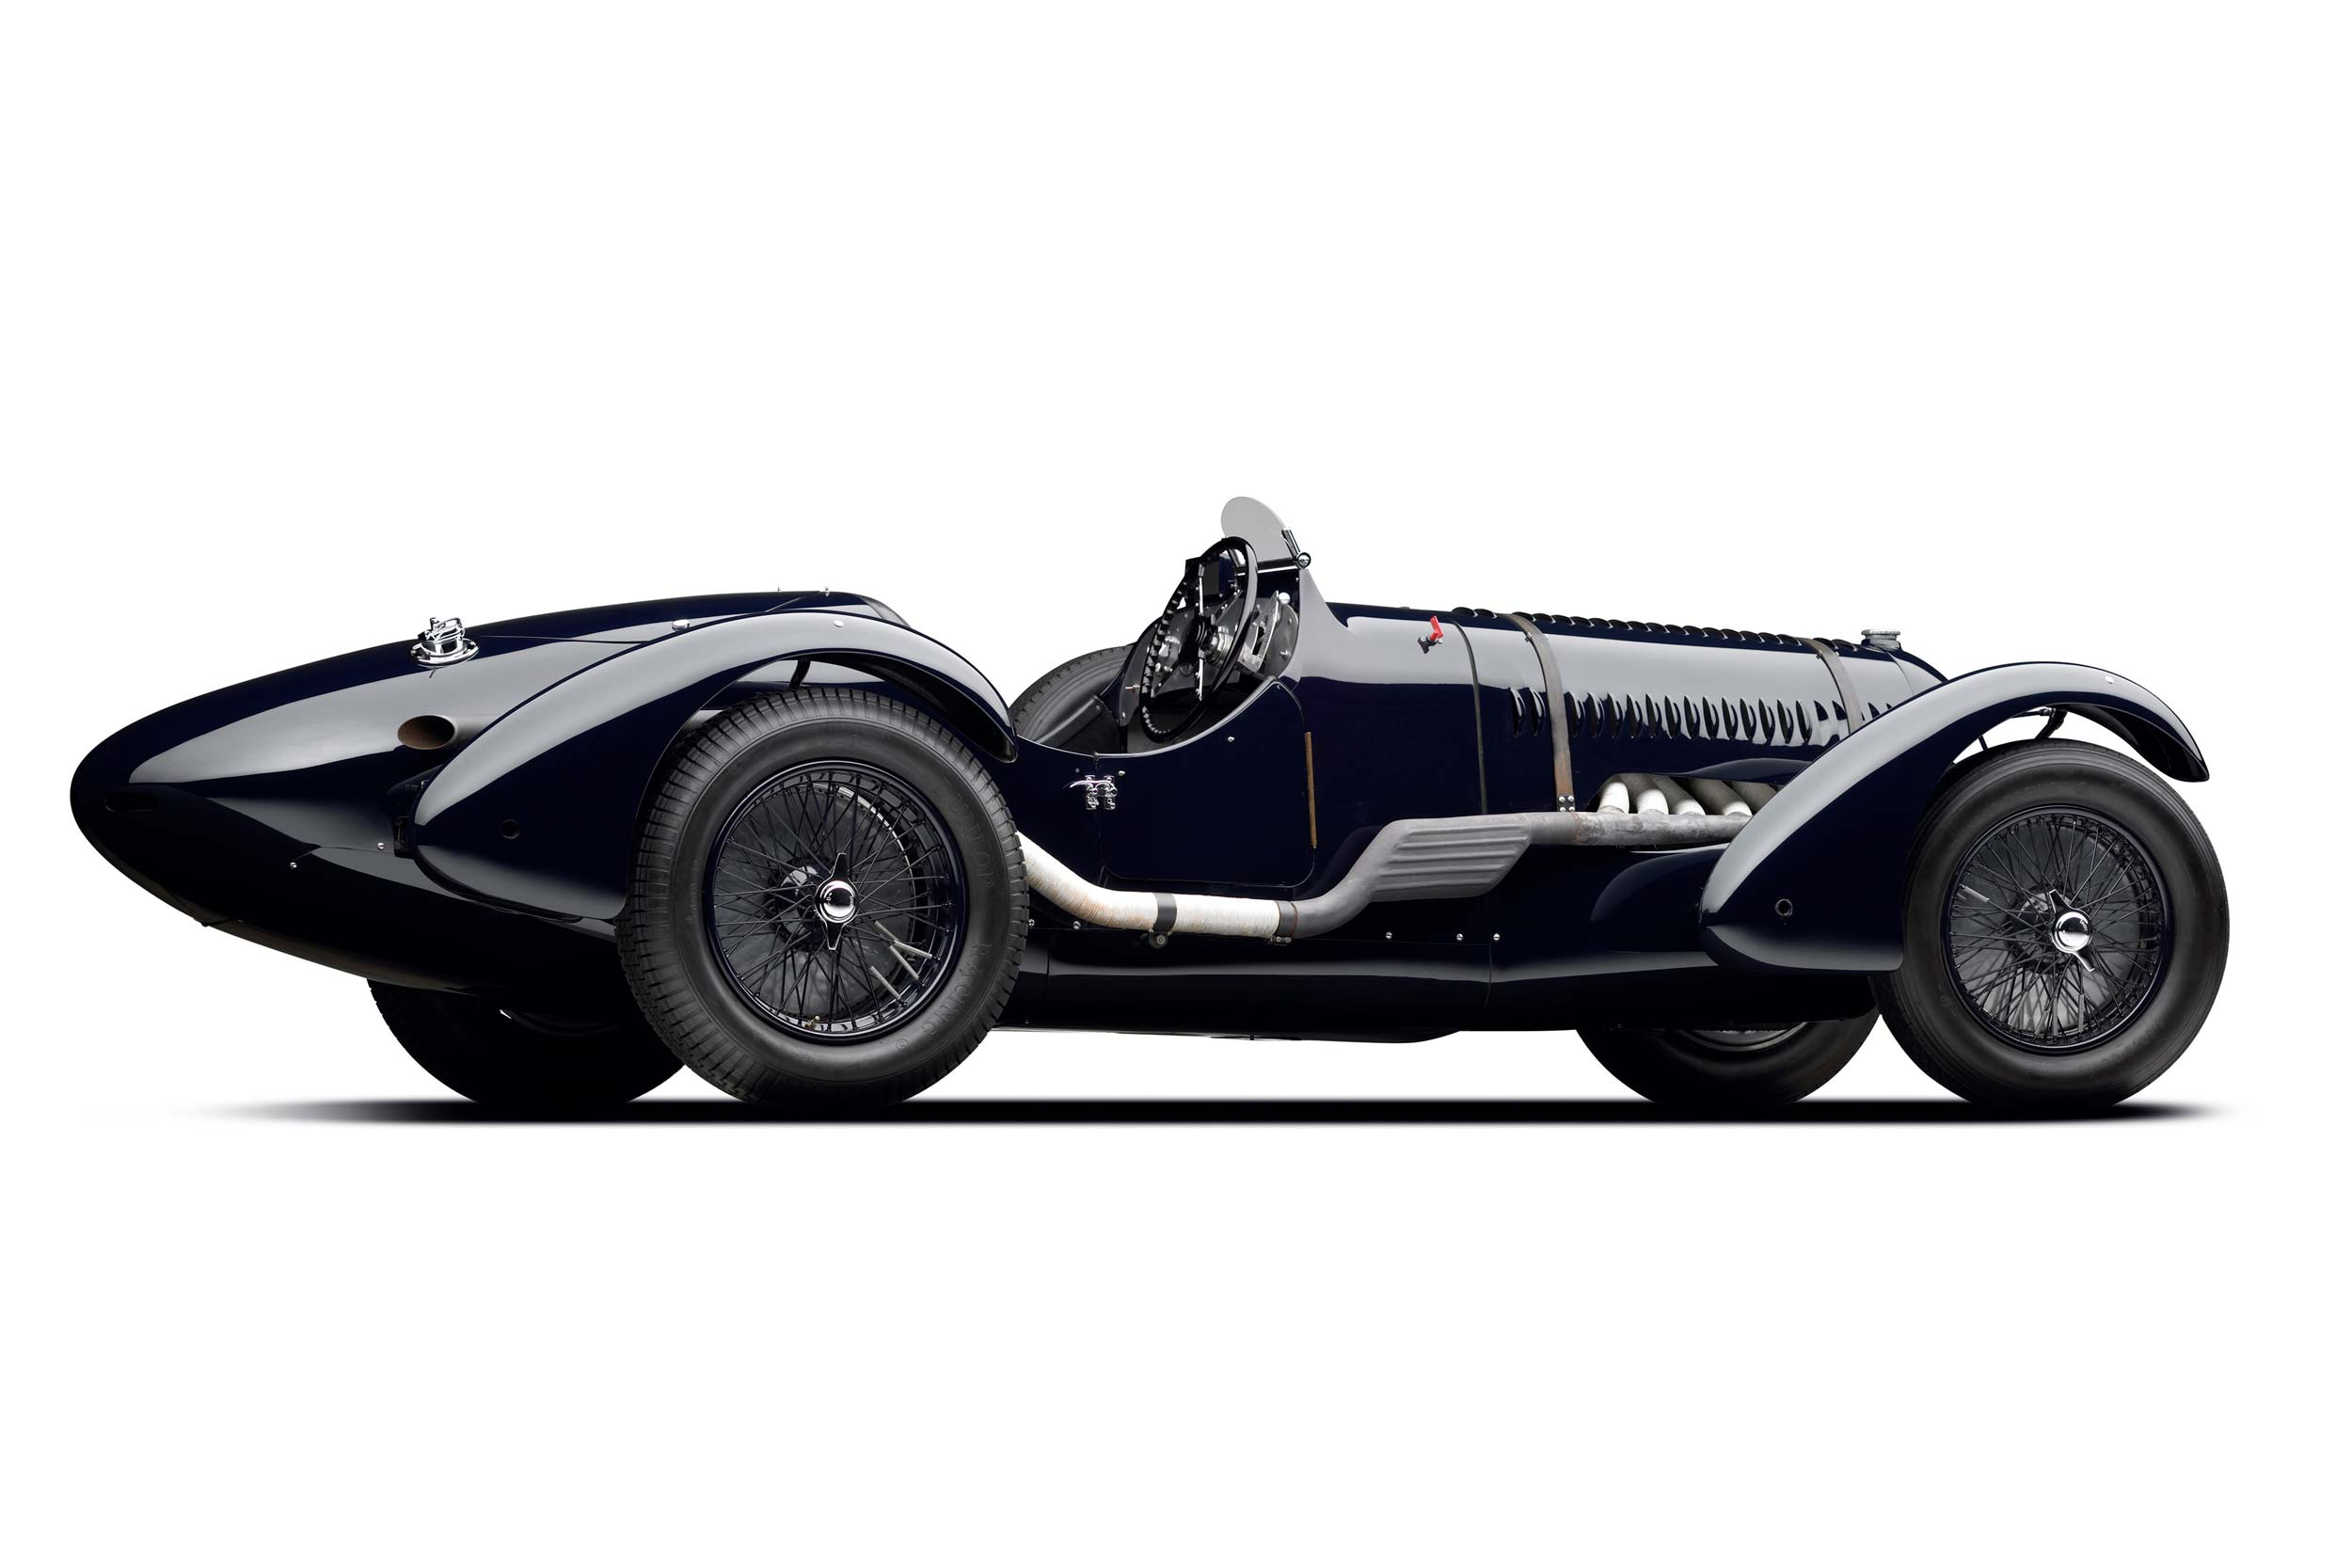 1938 Talbot Lago Type 26 SS